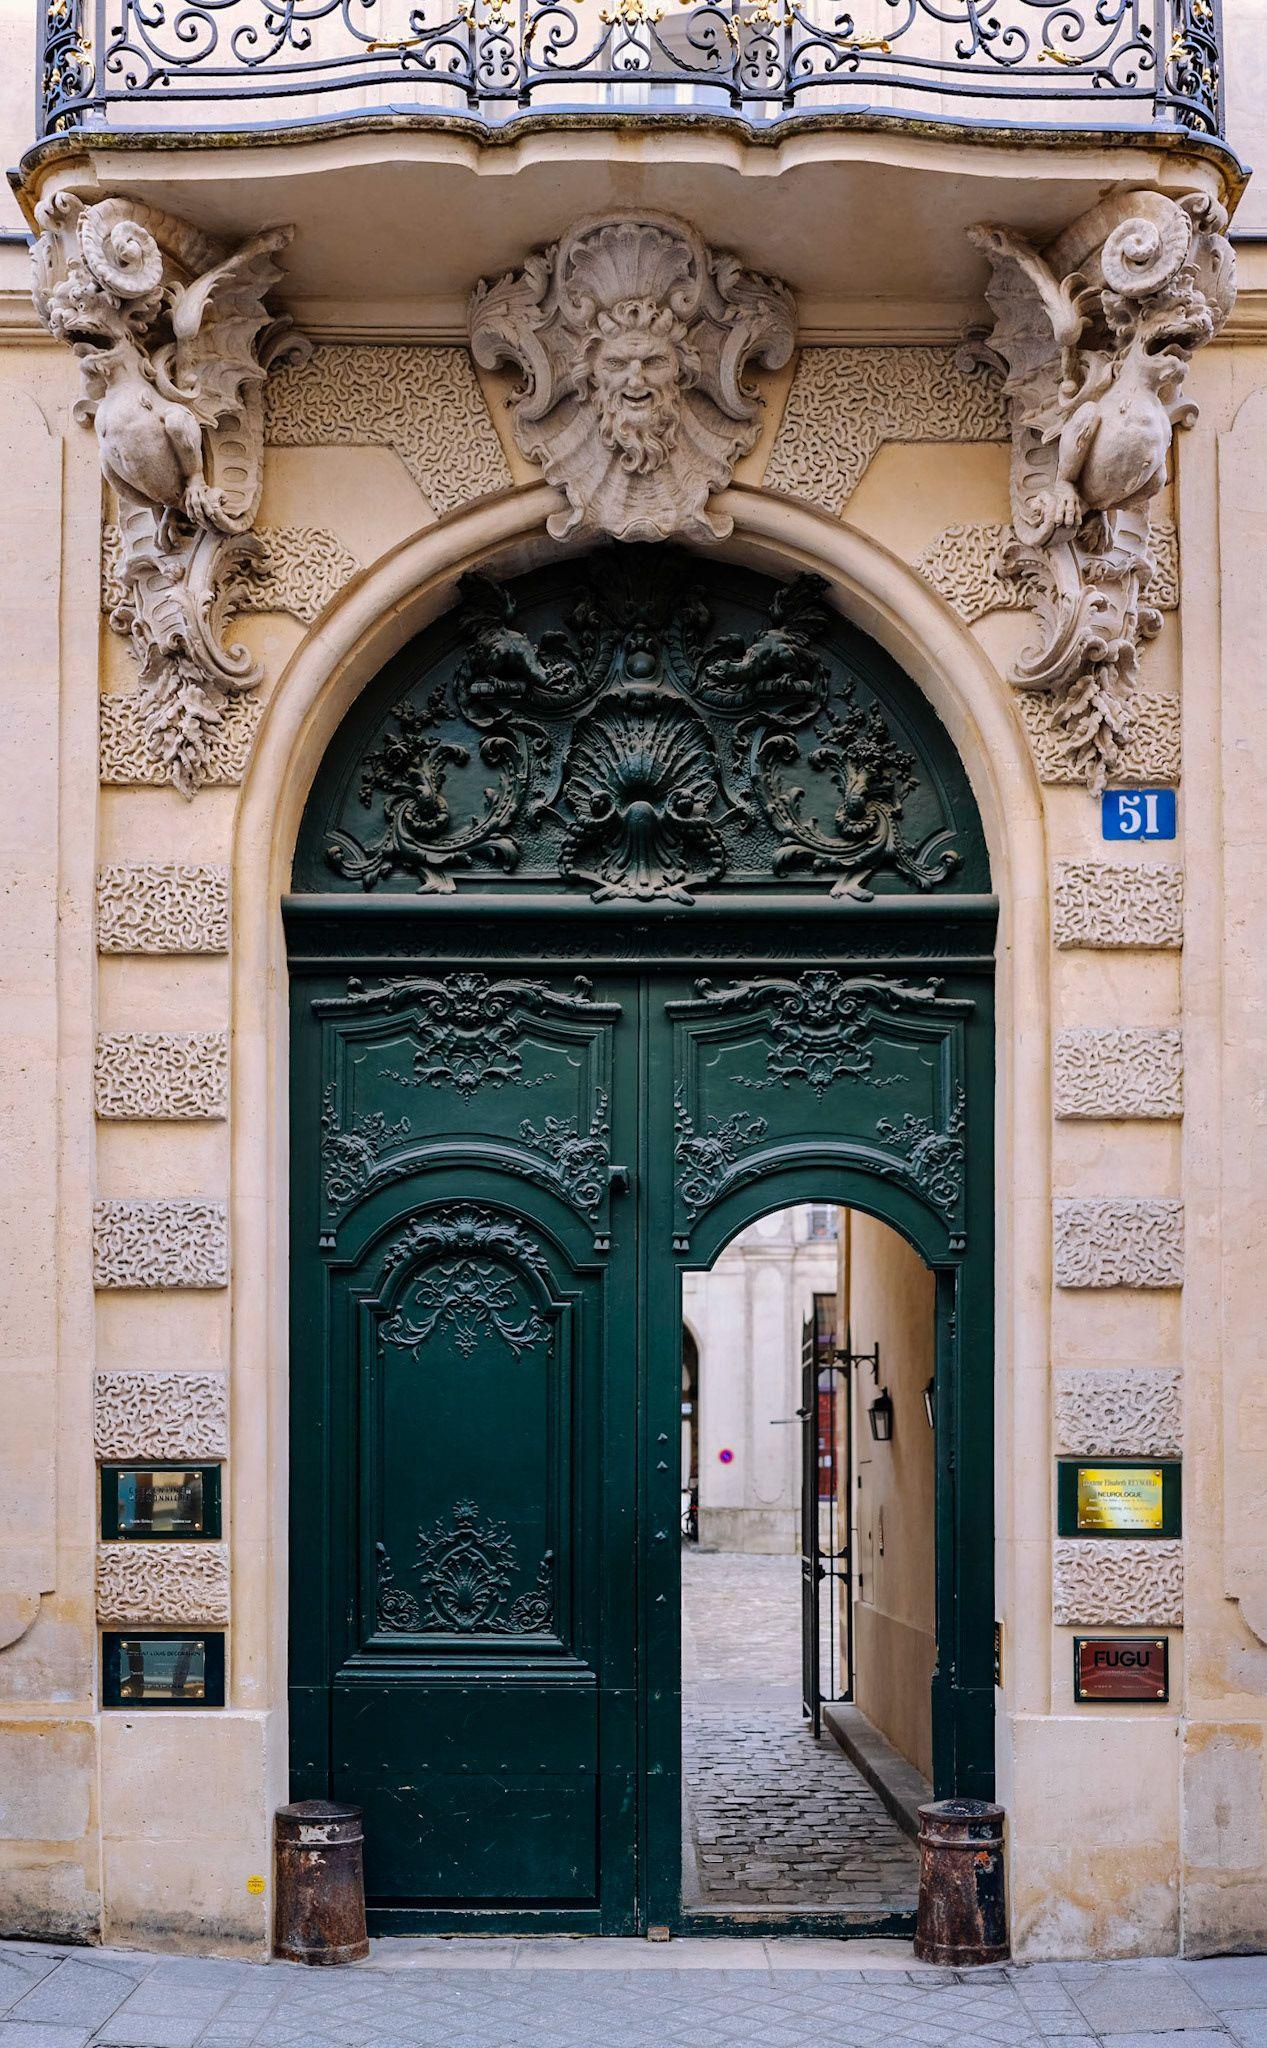 Decorative courtyard entrance in Paris